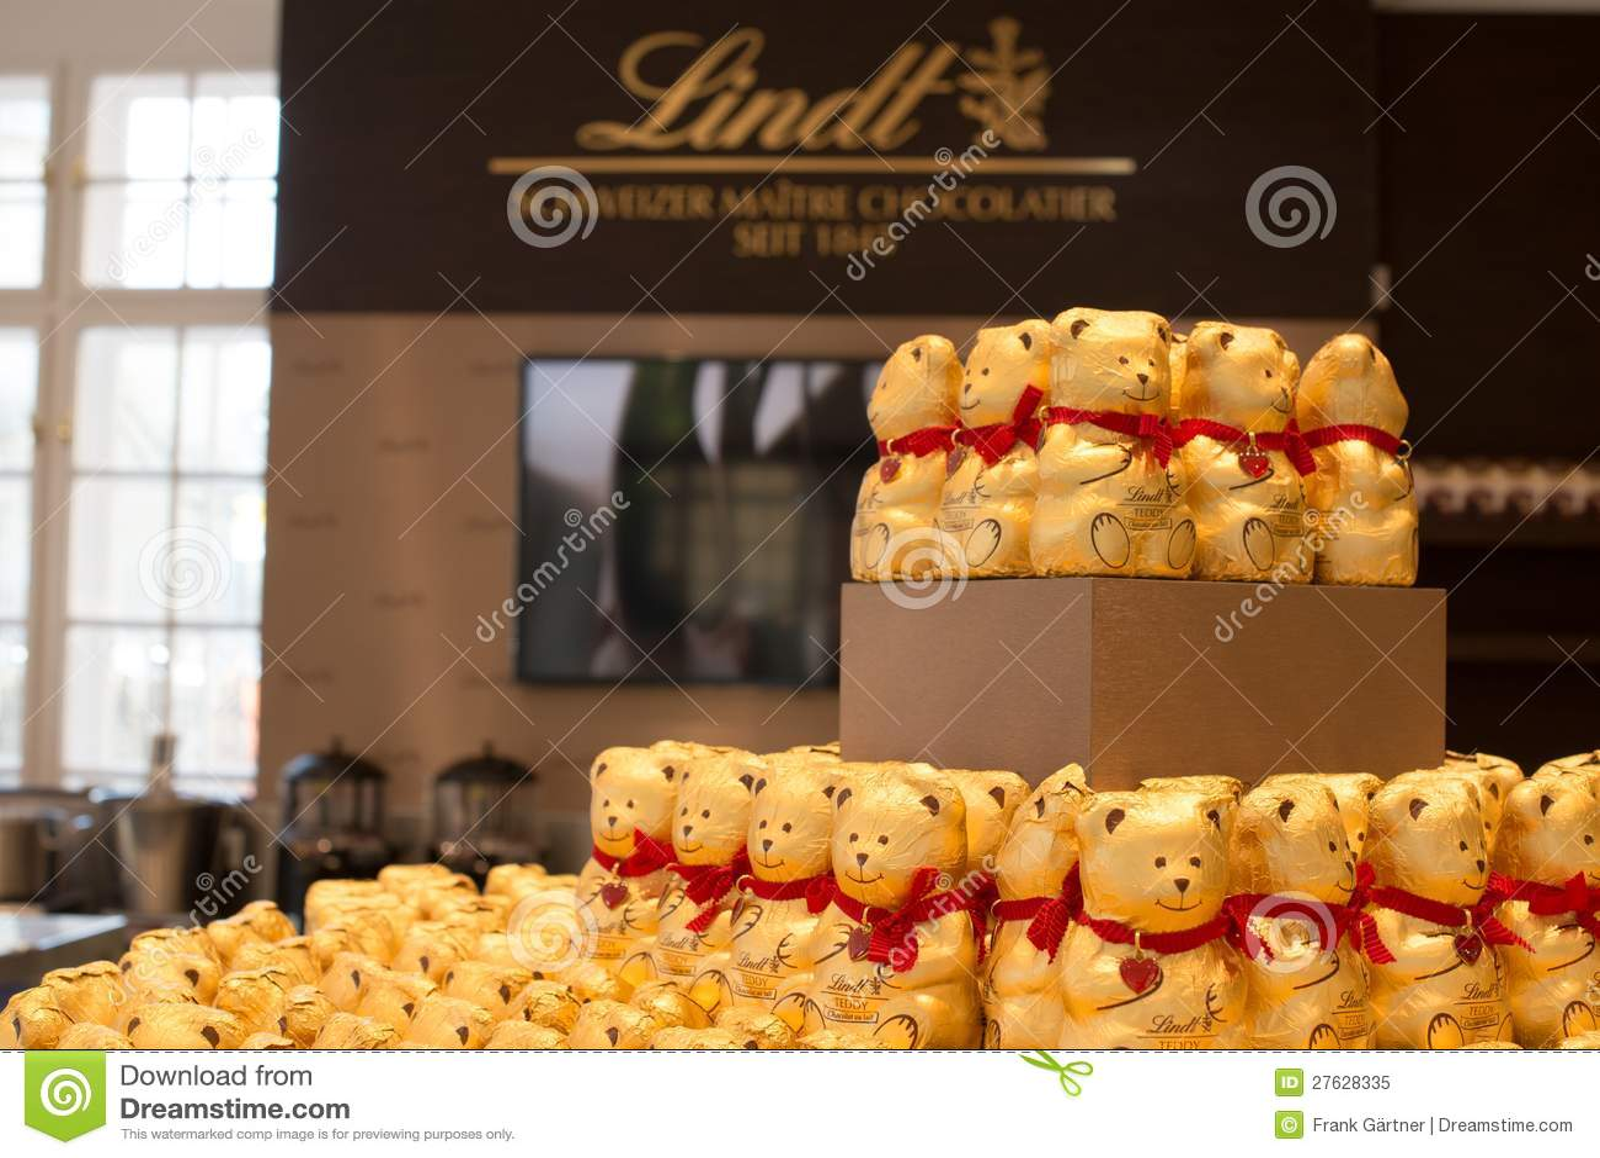 Lindt Chocolate Boutique In Vienna Austria Editorial